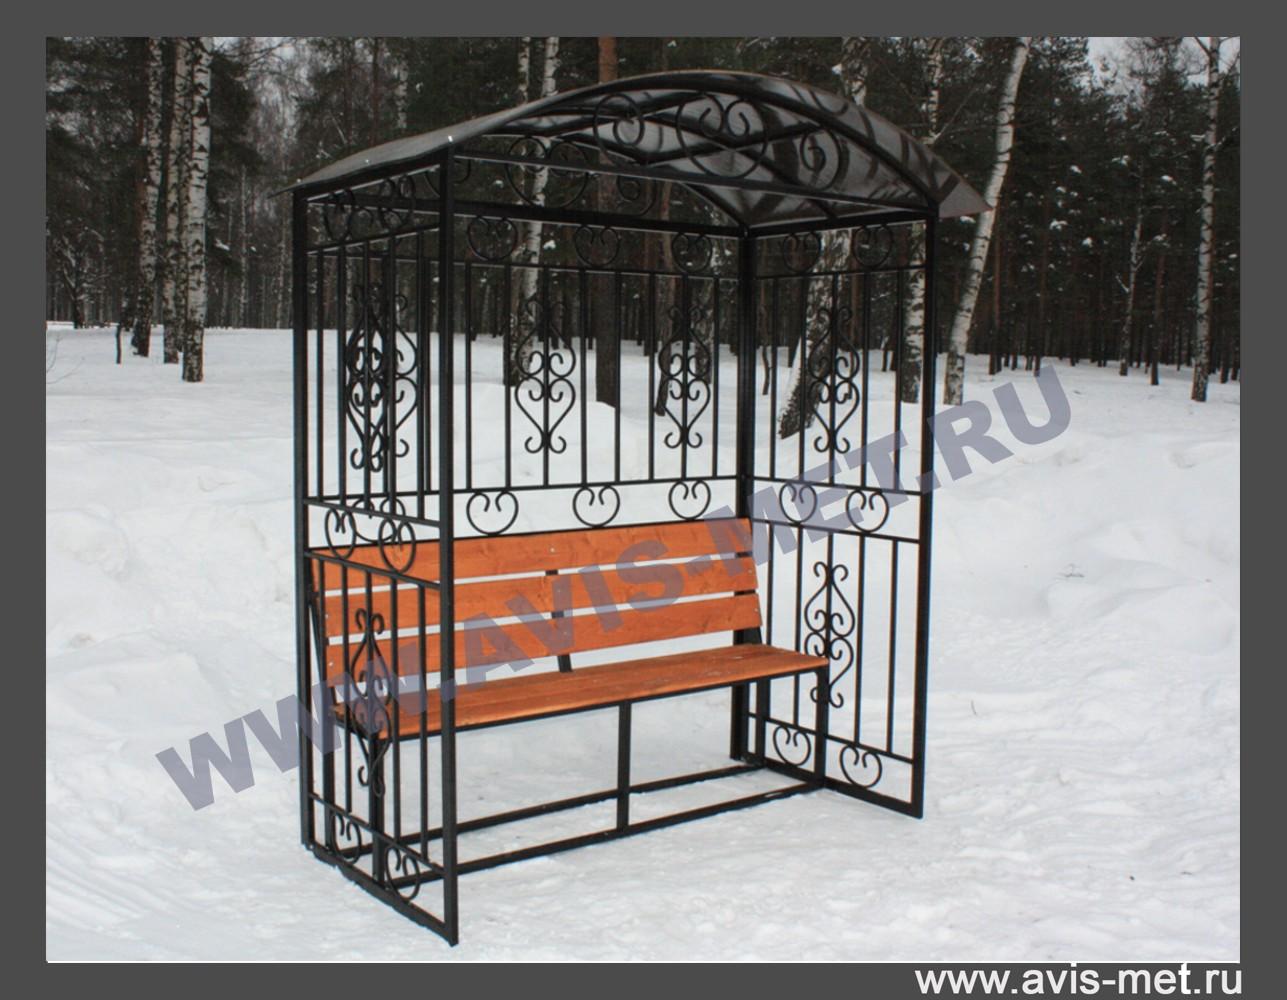 Скамейка с навесом для дачи своими руками фото